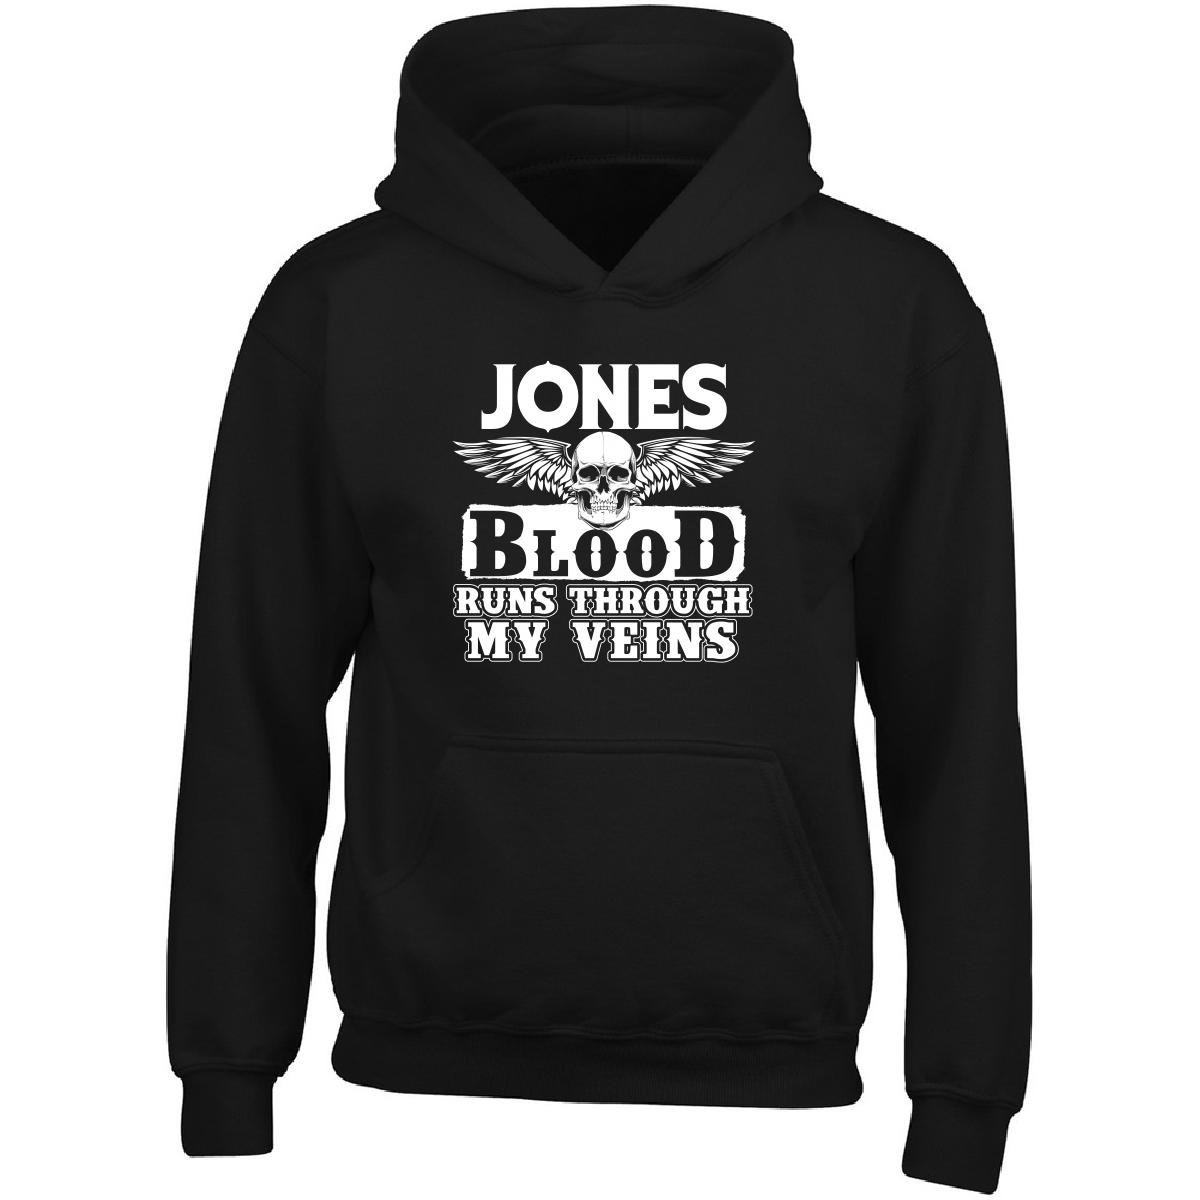 Jones Blood Runs Through My Veins Family Adult Hoodie L Black